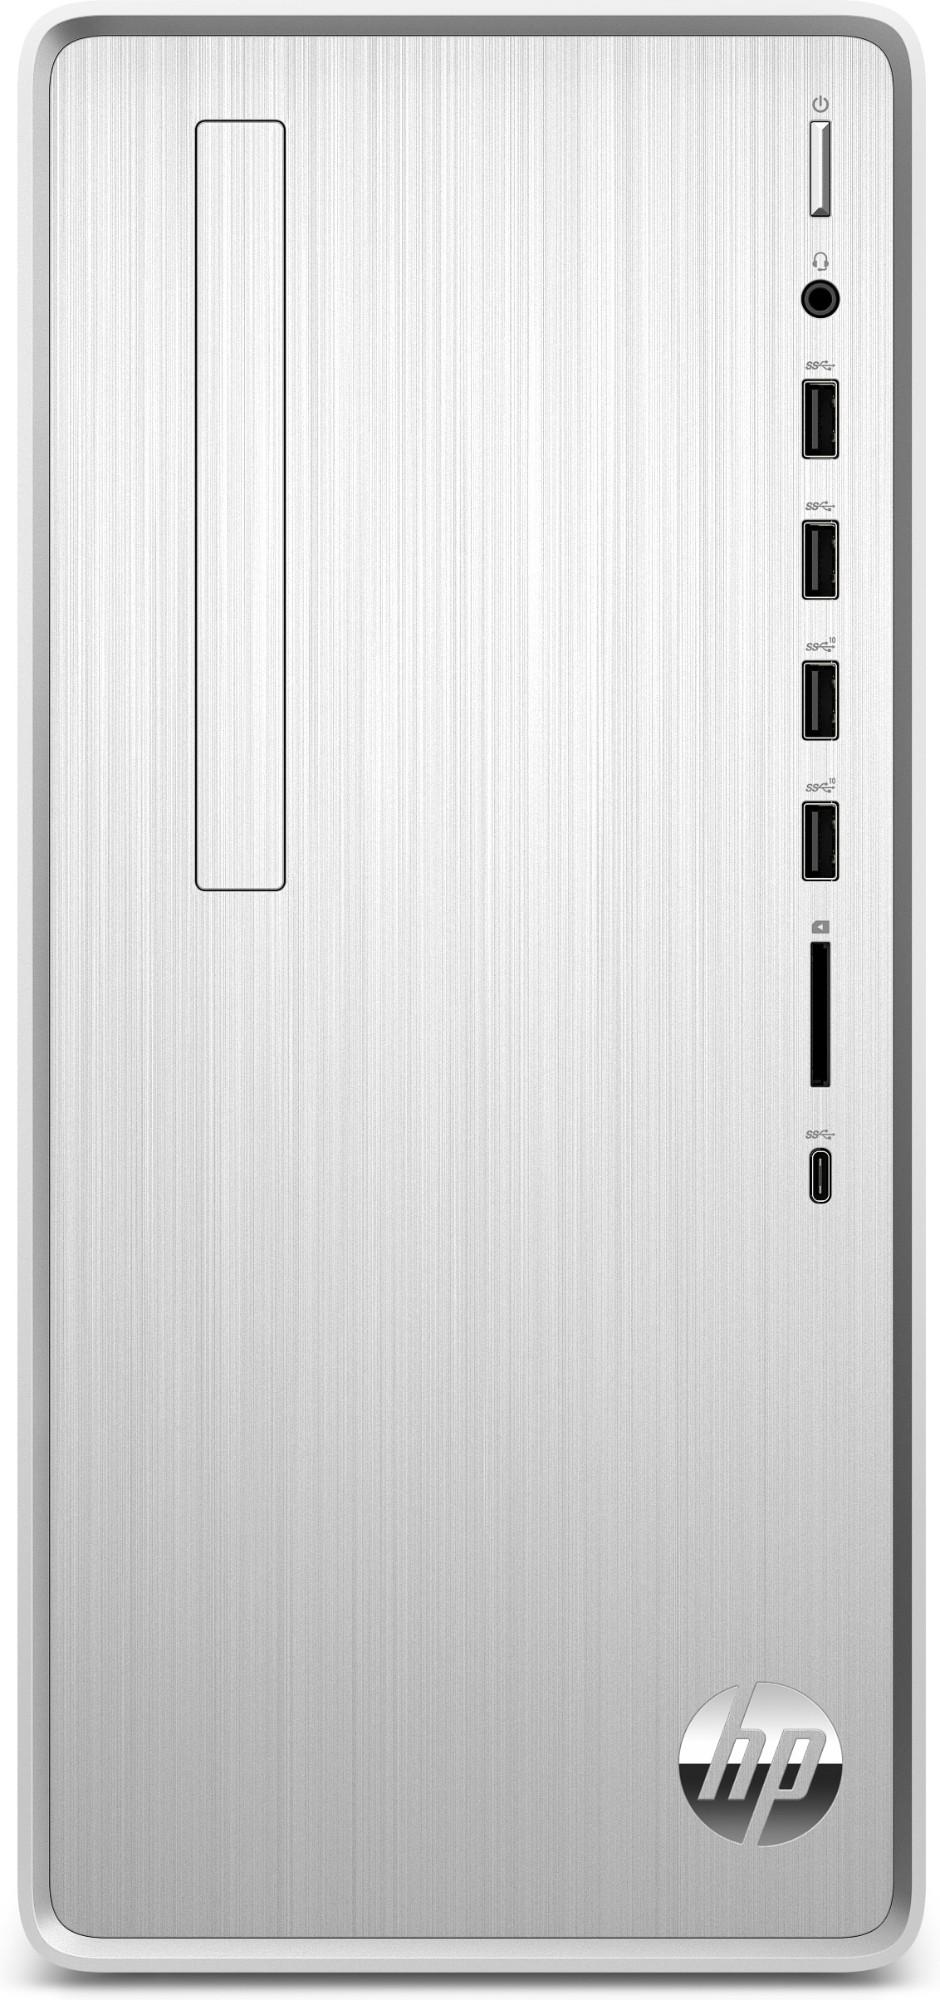 HP Pavilion TP01-0026na 9th gen Intel® Core™ i5 i5-9400 8 GB DDR4-SDRAM 1256 GB HDD+SSD Mini Tower Silver PC Windows 10 Home